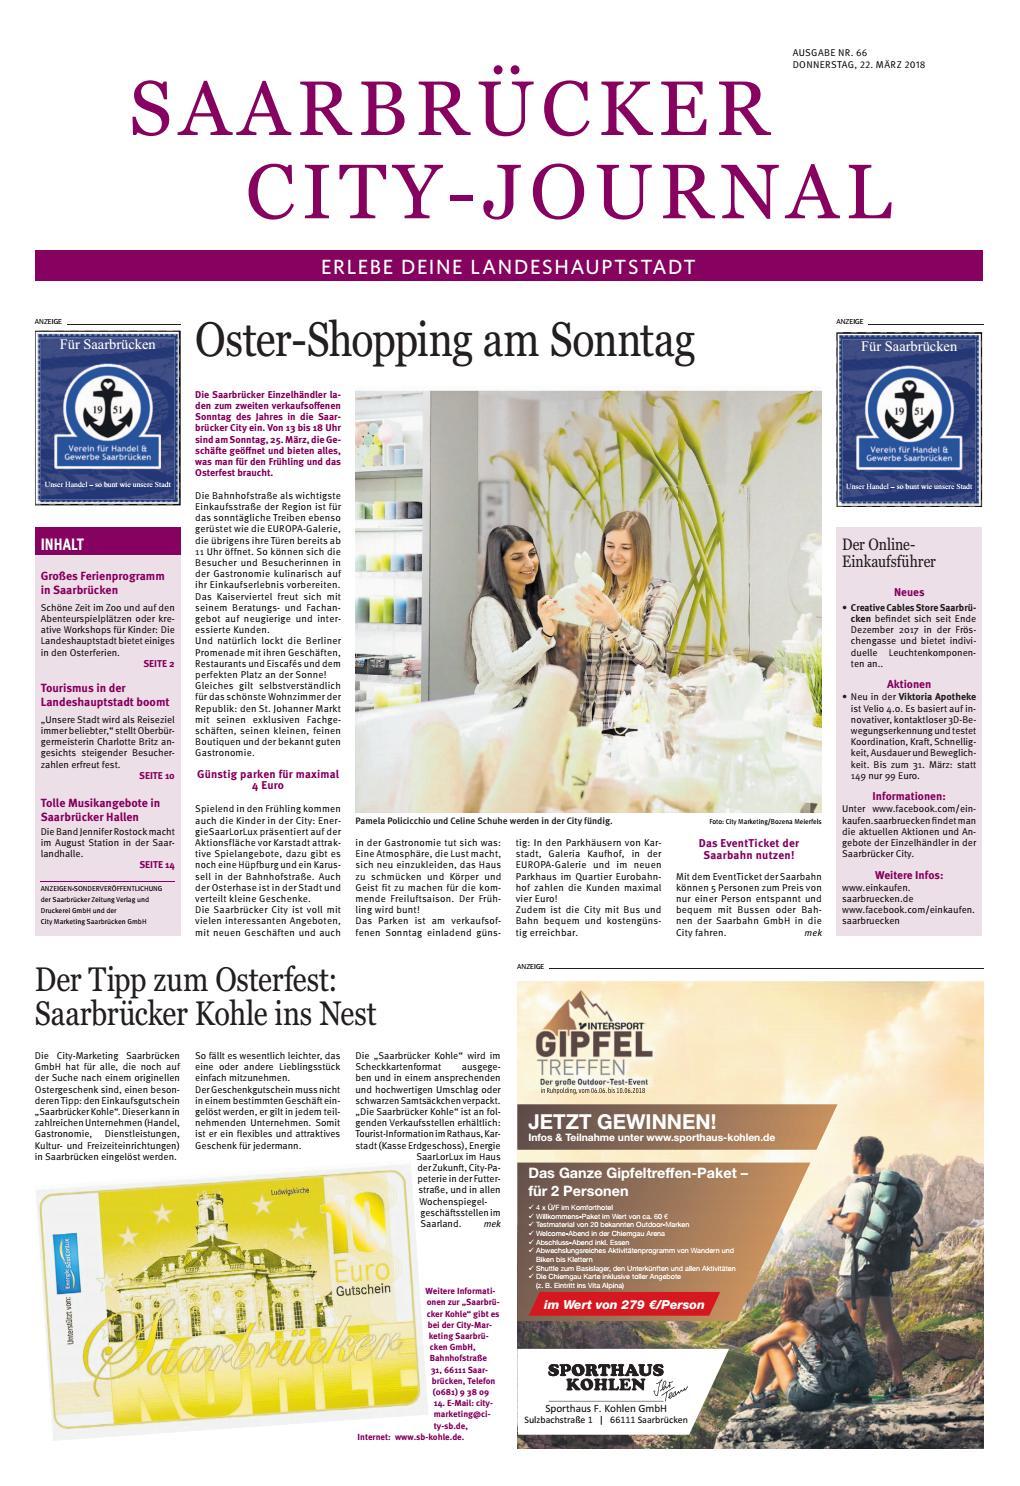 Saarbrücker City Journal Ausgabe Nr 66, 22.03.2018 By Saarbrücker  VerlagsService GmbH   Issuu